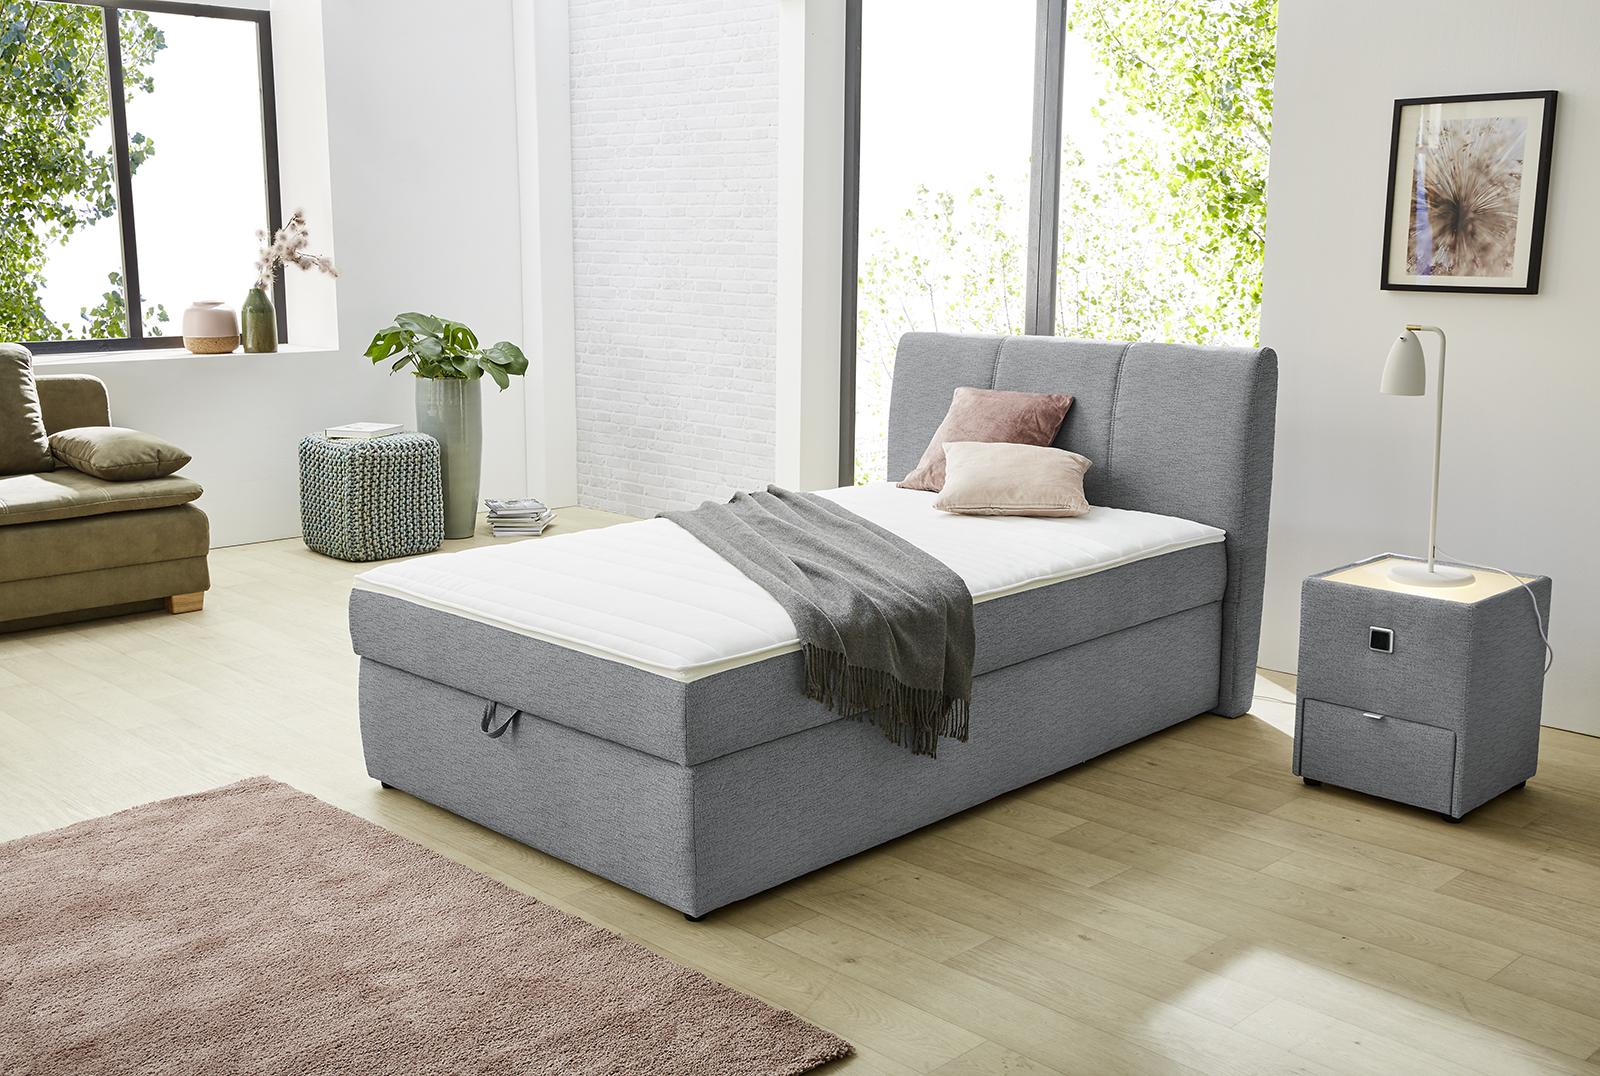 120x200 boxspringbett inkl topper sandra von jockenh fer hellgrau. Black Bedroom Furniture Sets. Home Design Ideas